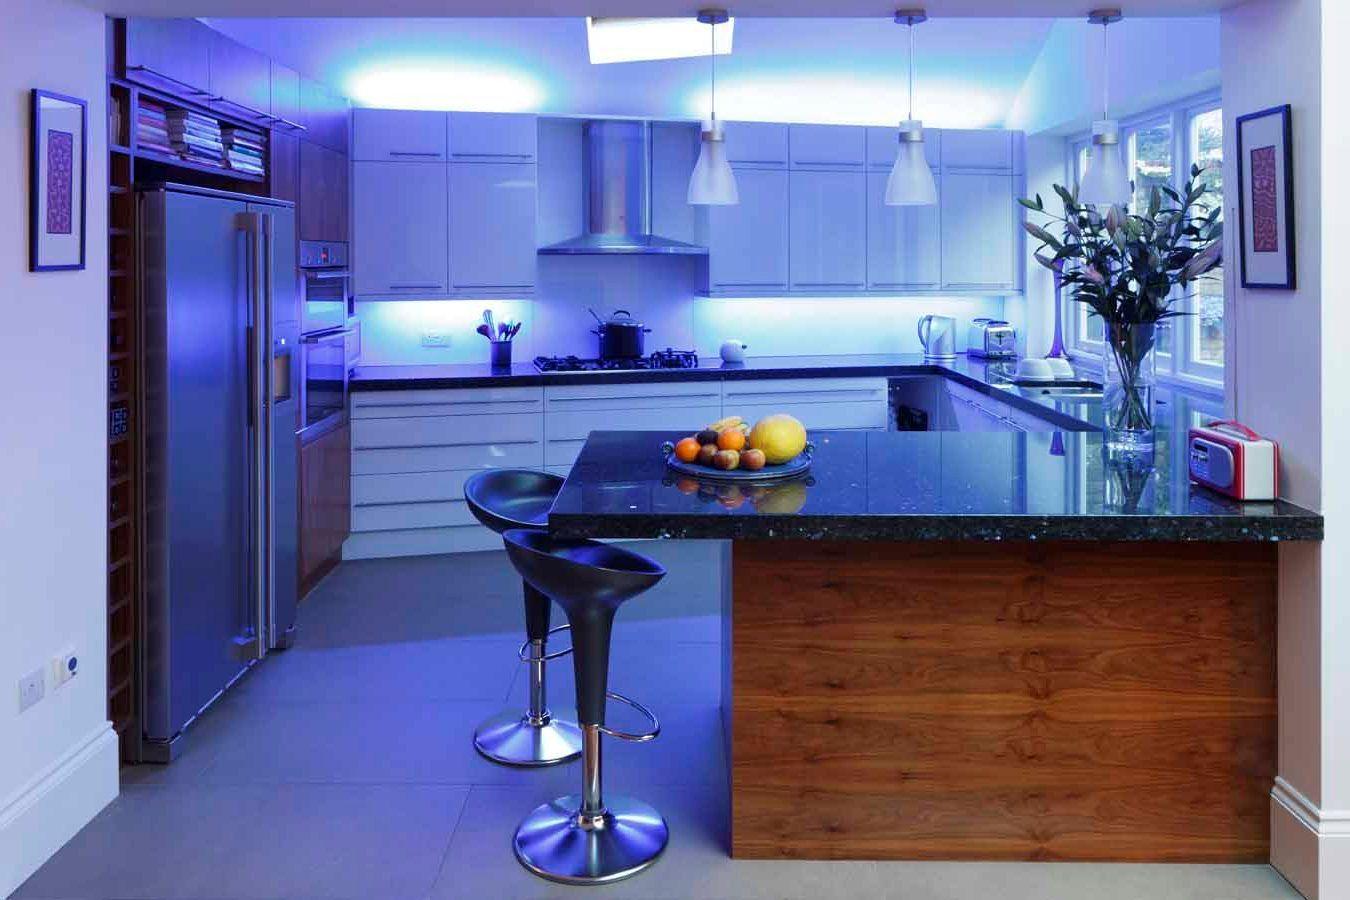 Idea de diseños de cocinas luces led | Diseño de Interiores ...